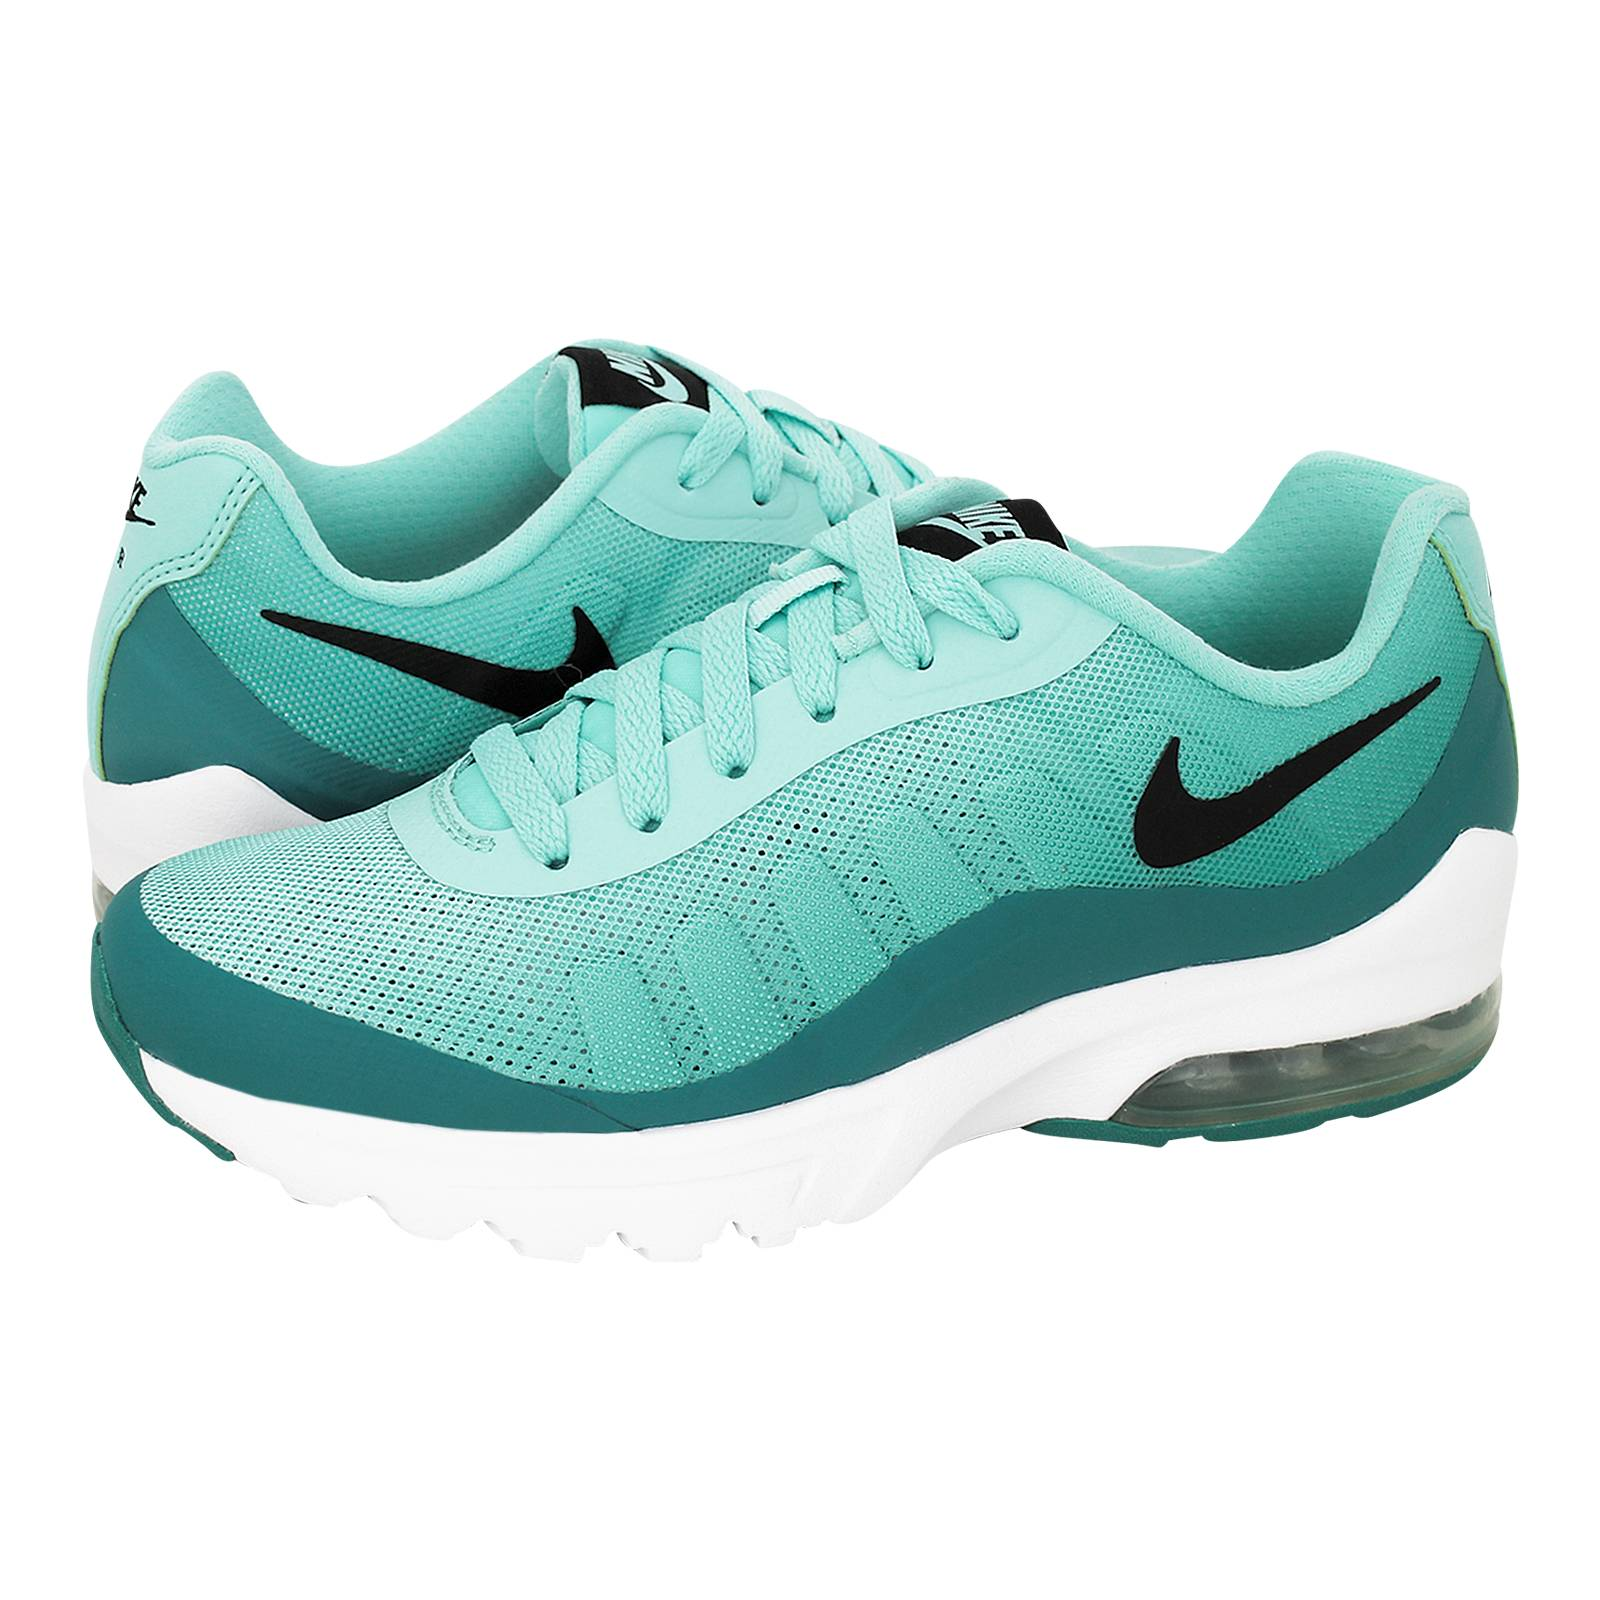 Air Max Invigor Print - Nike Women s athletic shoes made of fabric ... fe5b5d6e7